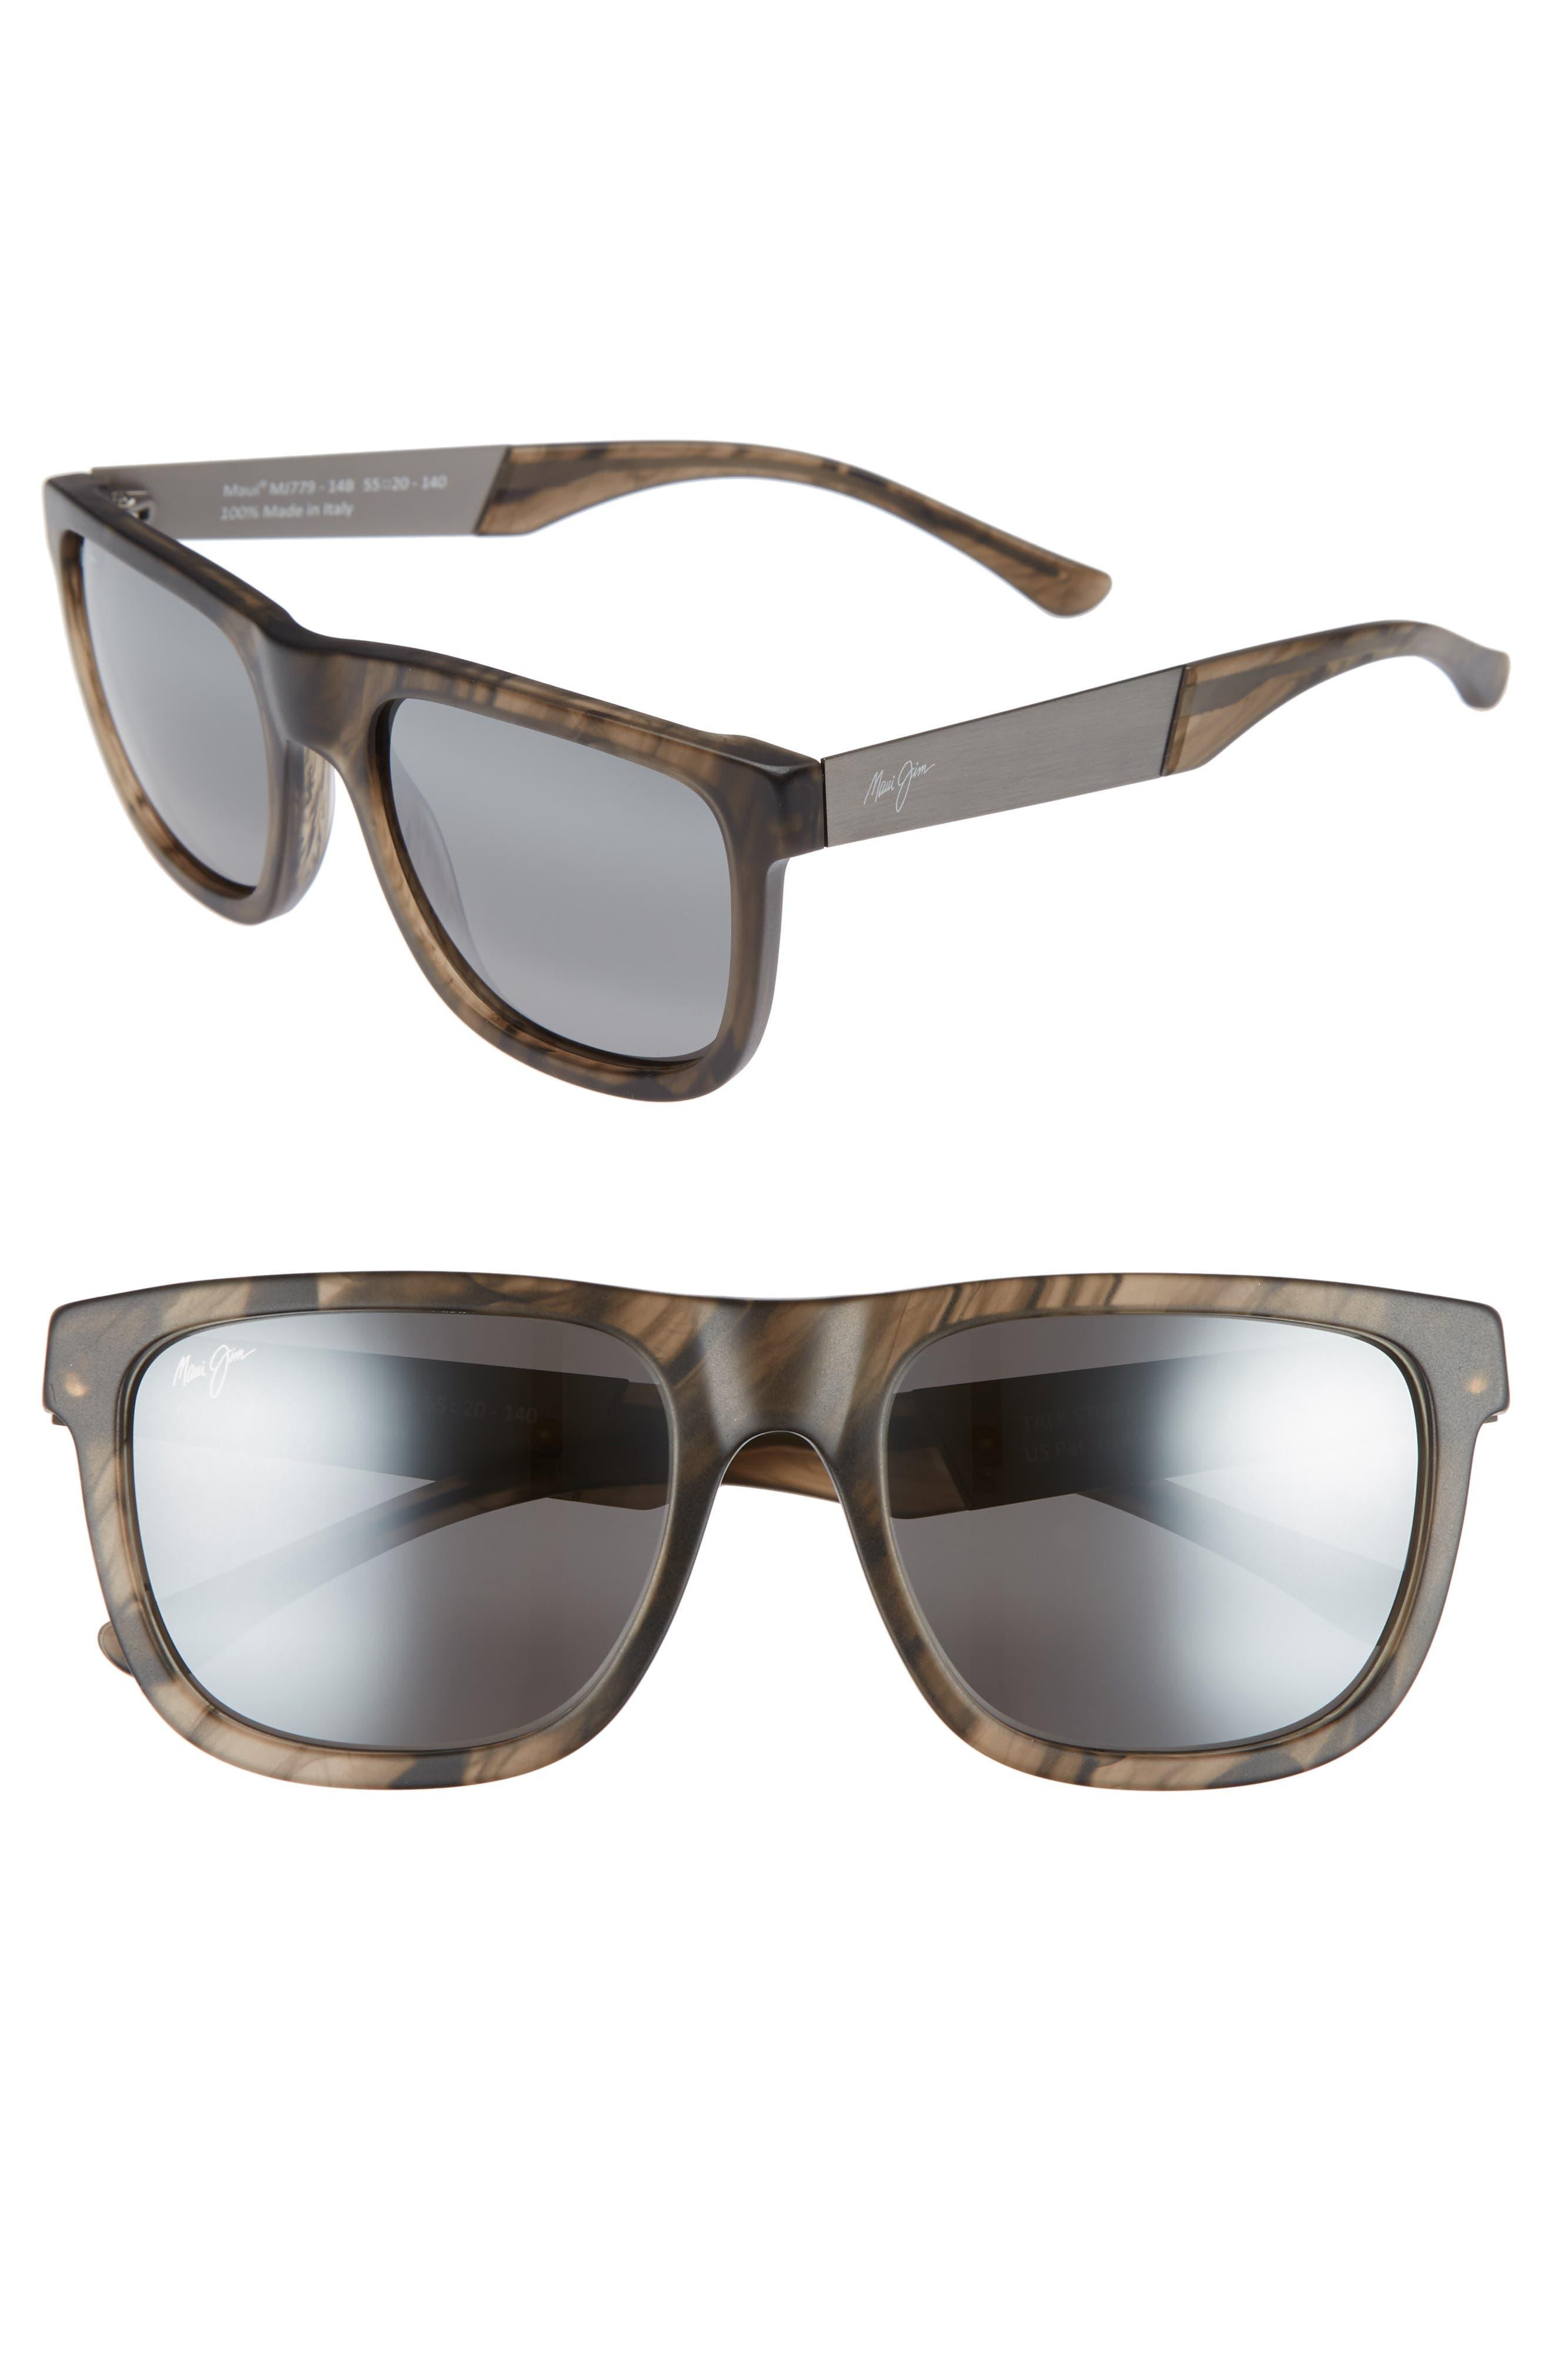 Maui Jim Talk Story 55Mm Polarized Sunglasses - Stormy Grey/ Neutral Grey